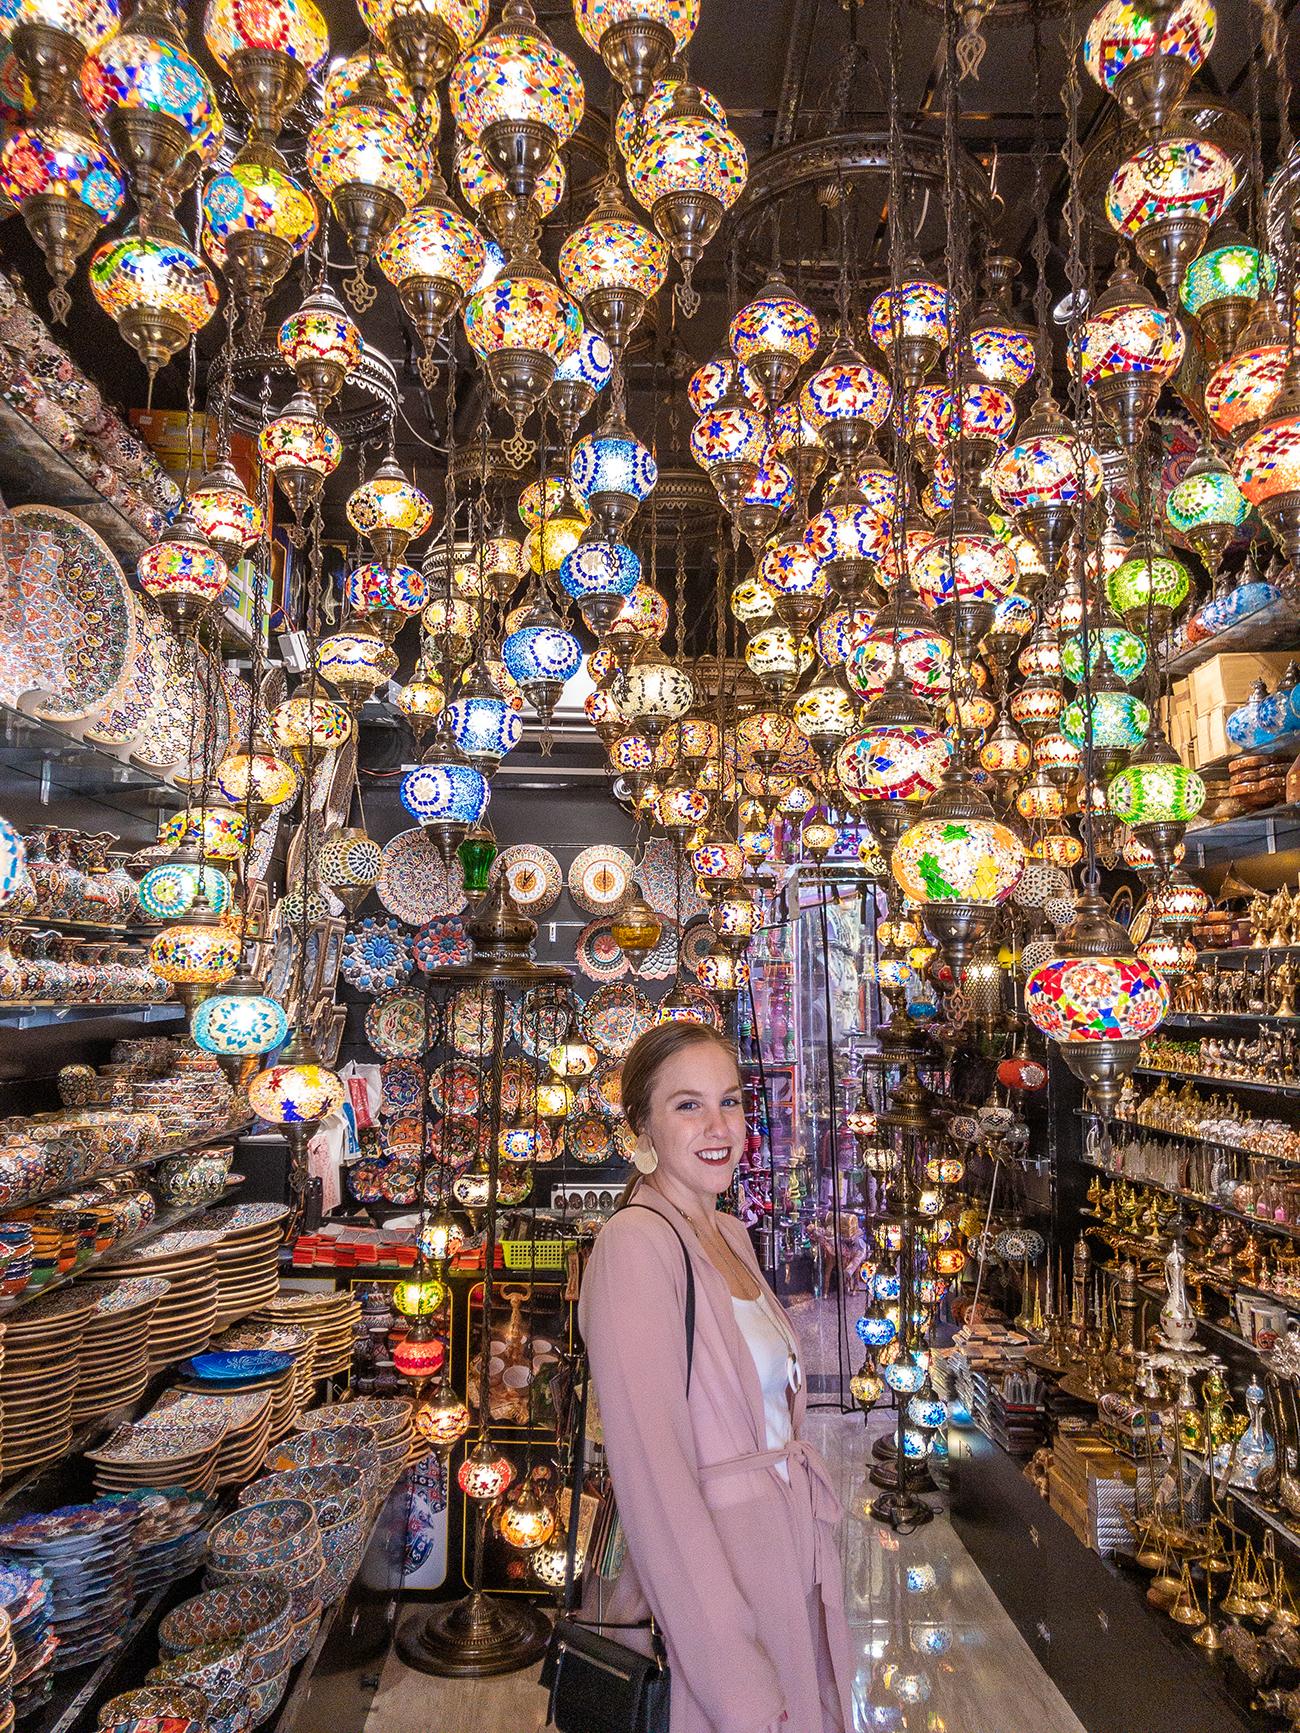 Gold Souk Spice Souk Textile Souk Old Dubai Shopping | What to Wear in Dubai